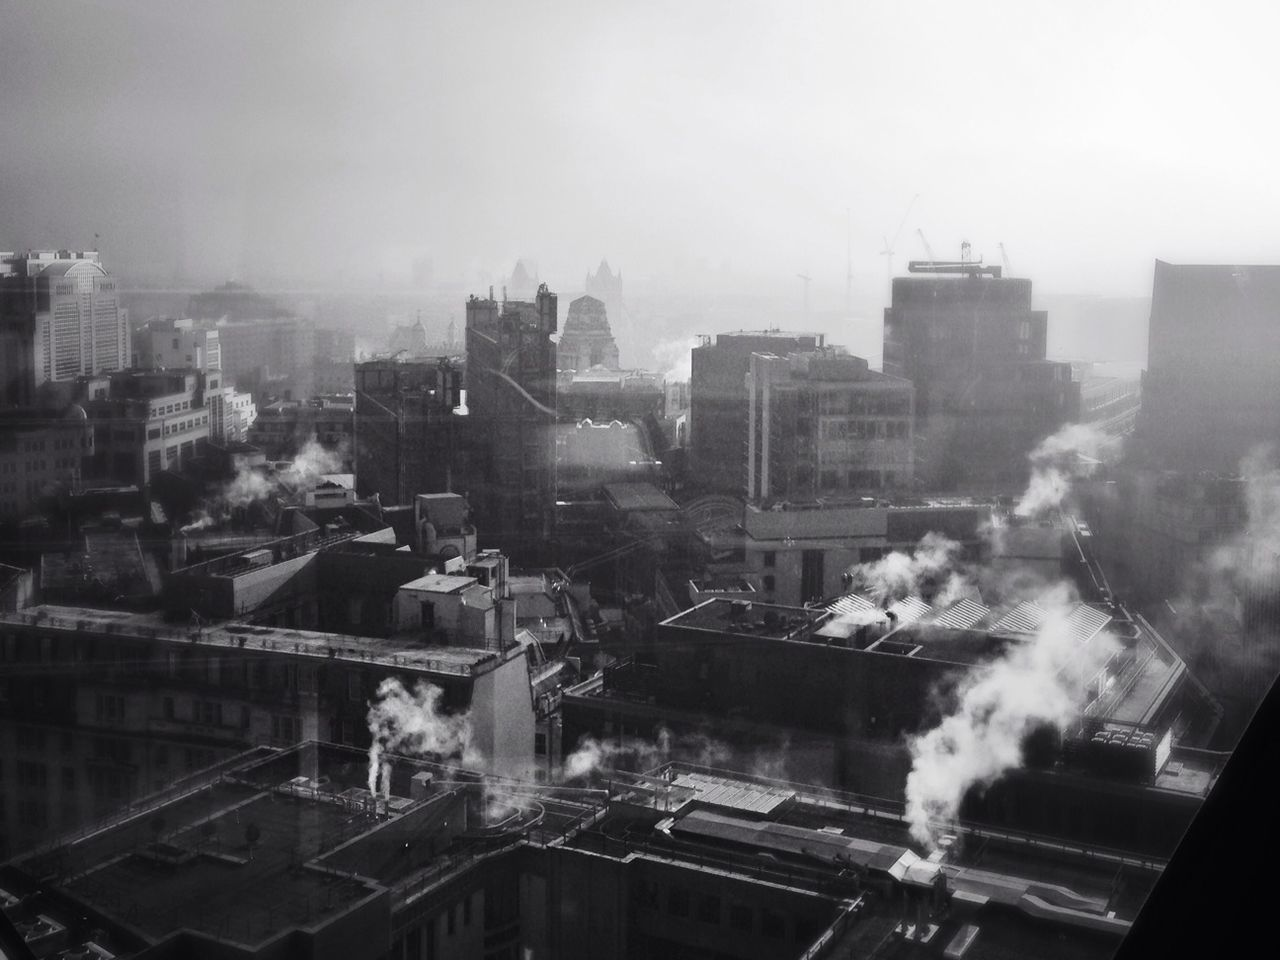 Air Pollution, Architecture, Building Exterior, Built Structure, Capital Cities